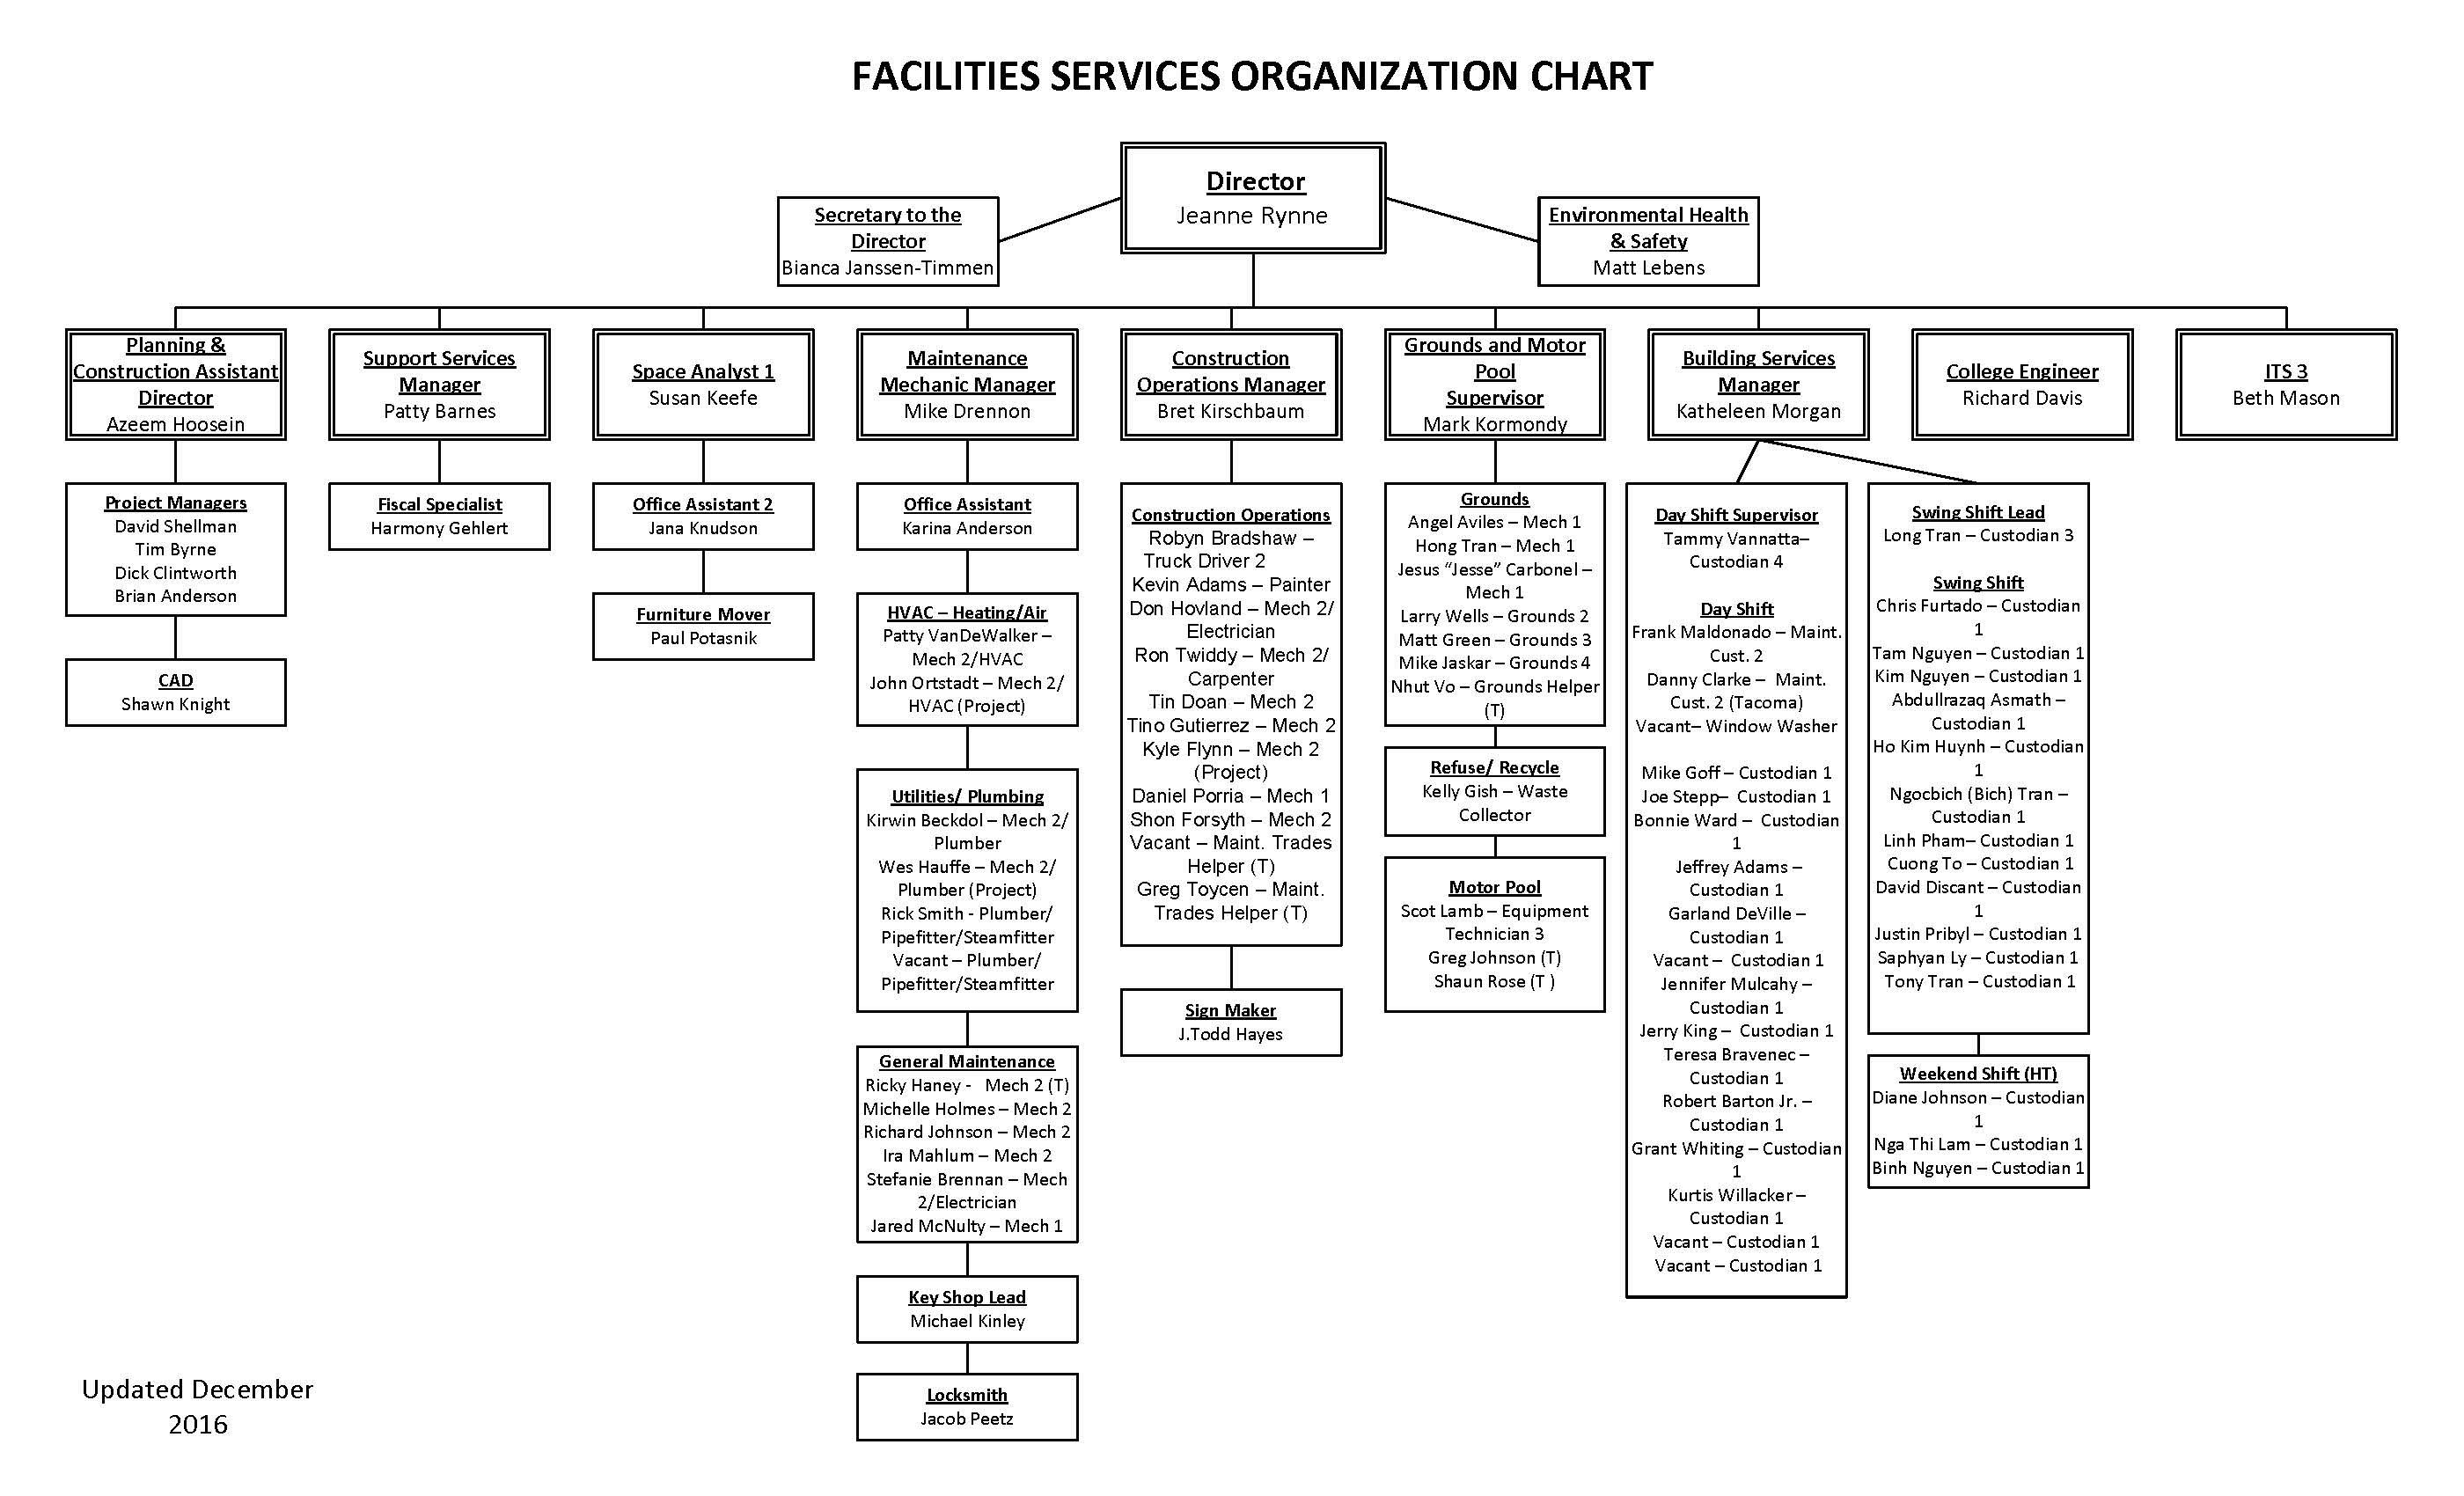 Facilities Org Chart December 2016 (JPG)